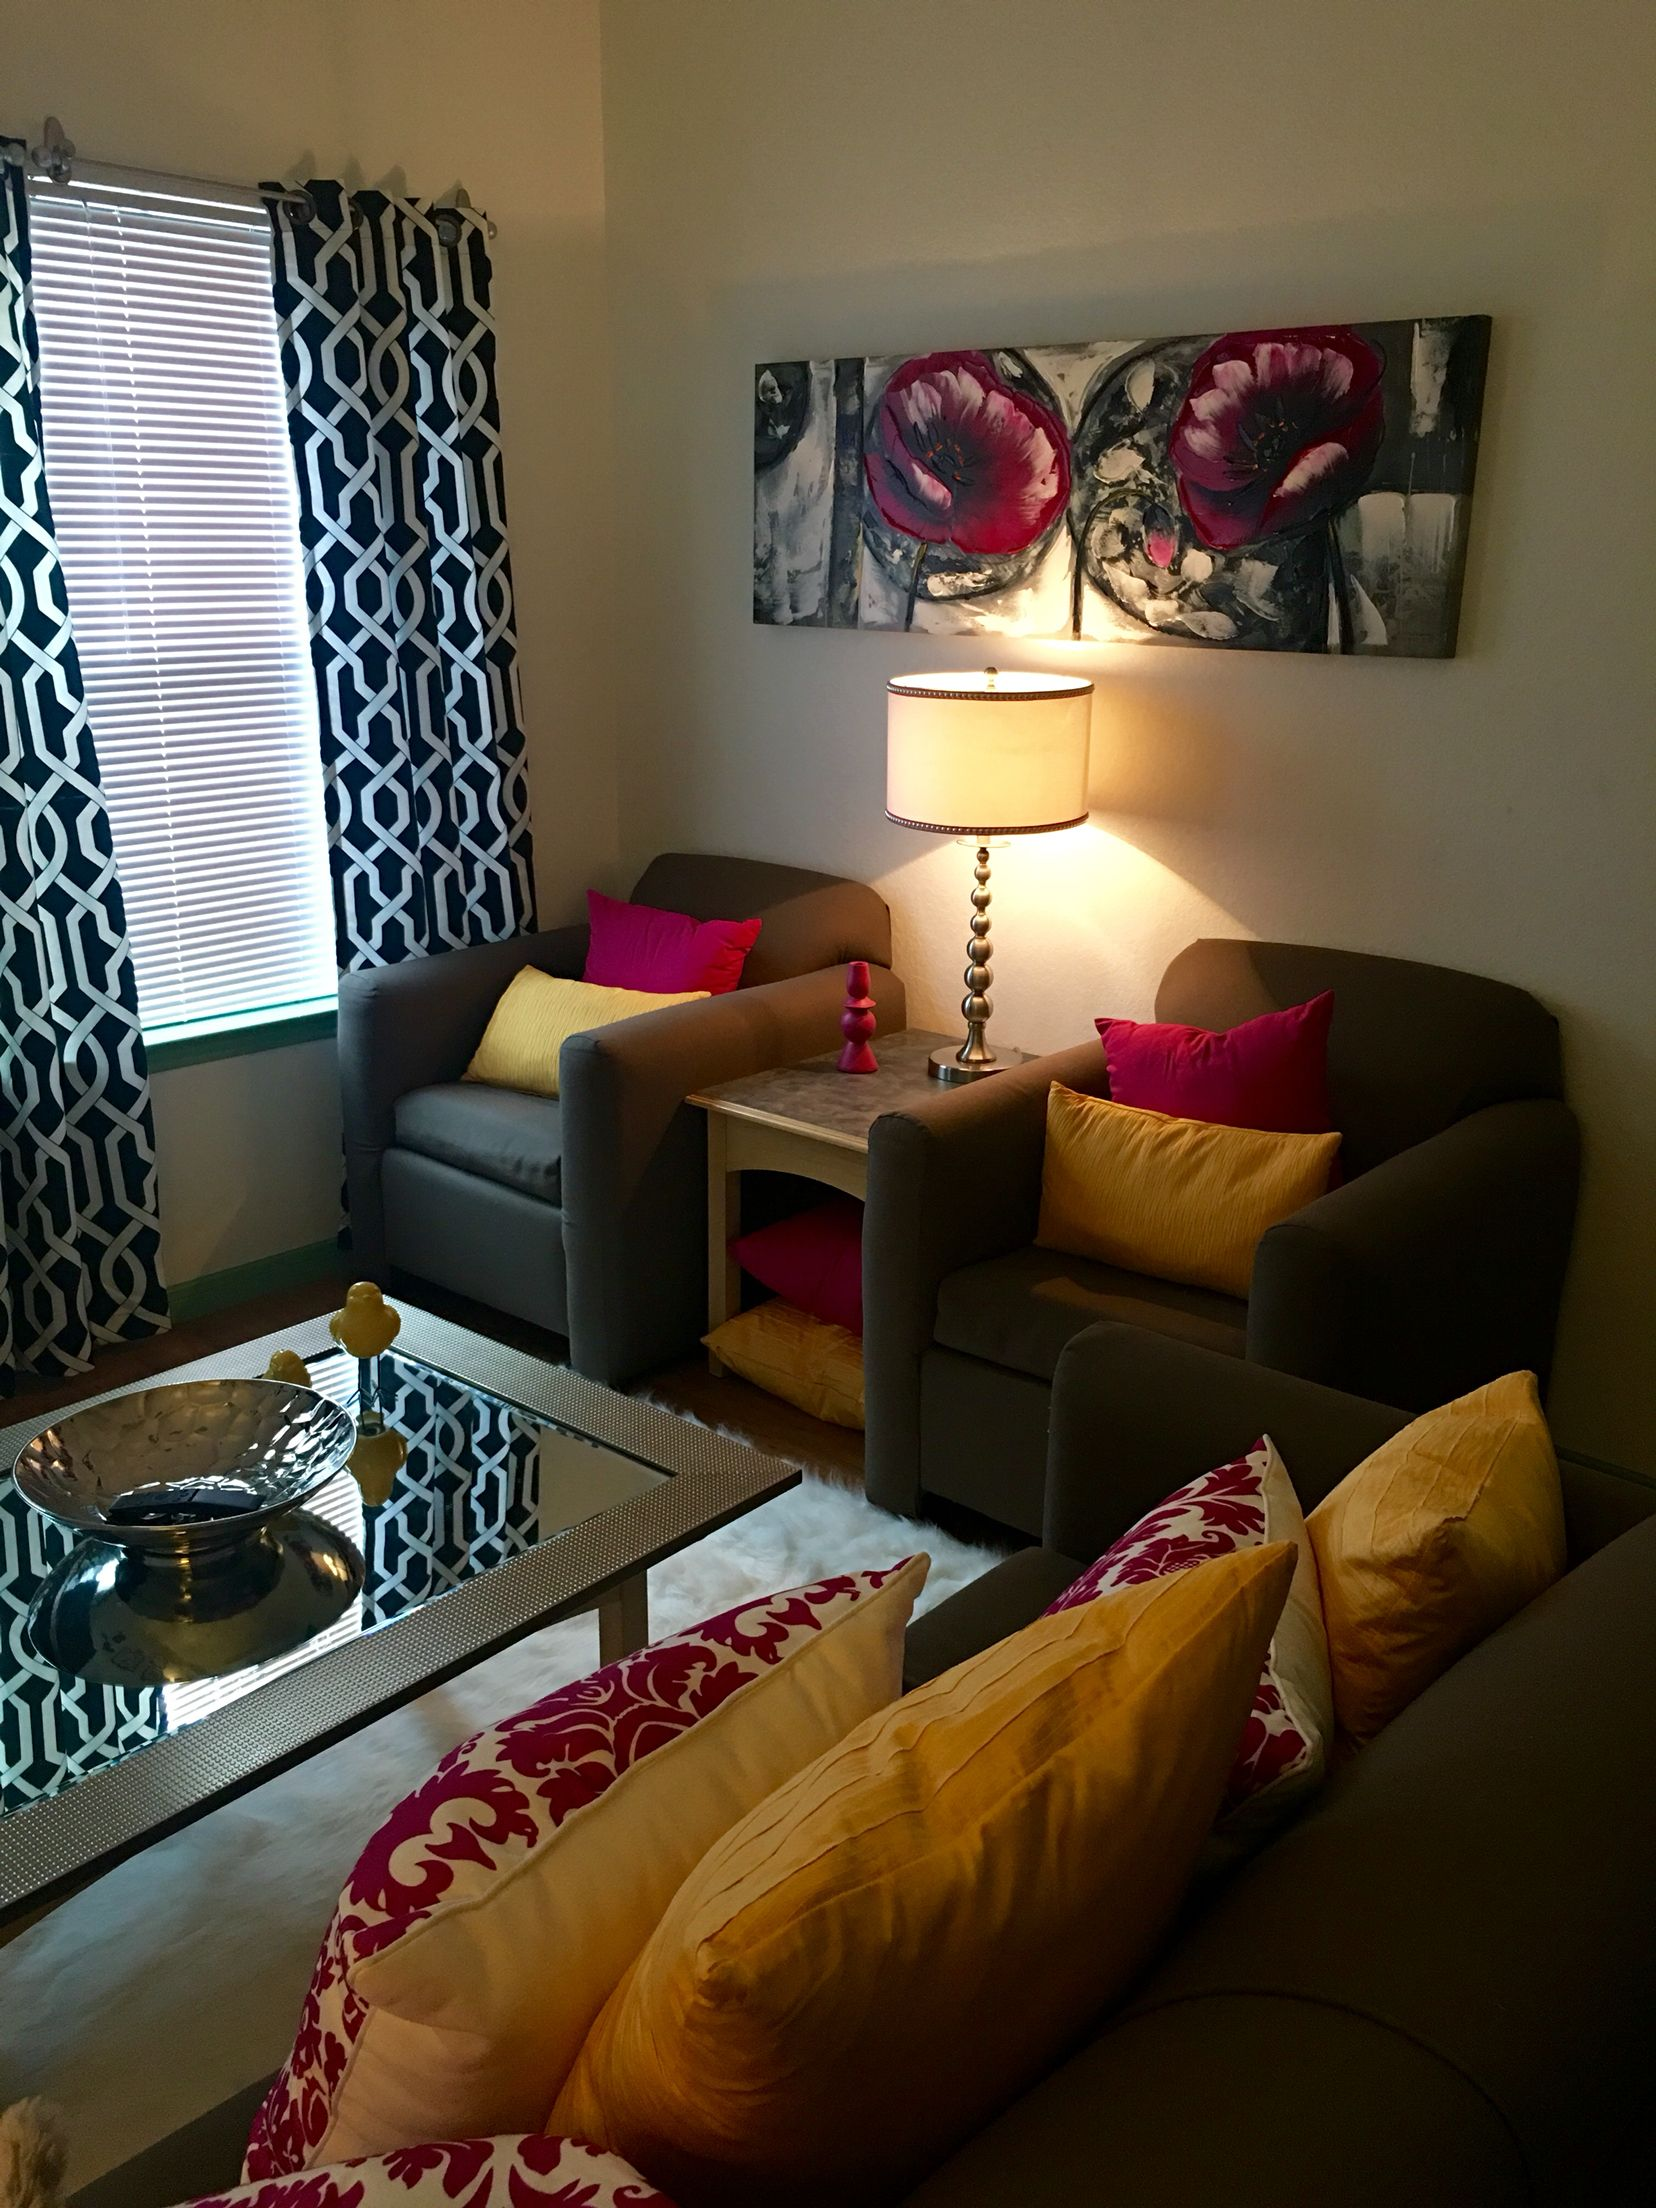 Texas State San Marcos Hall  Allies Dorm Room